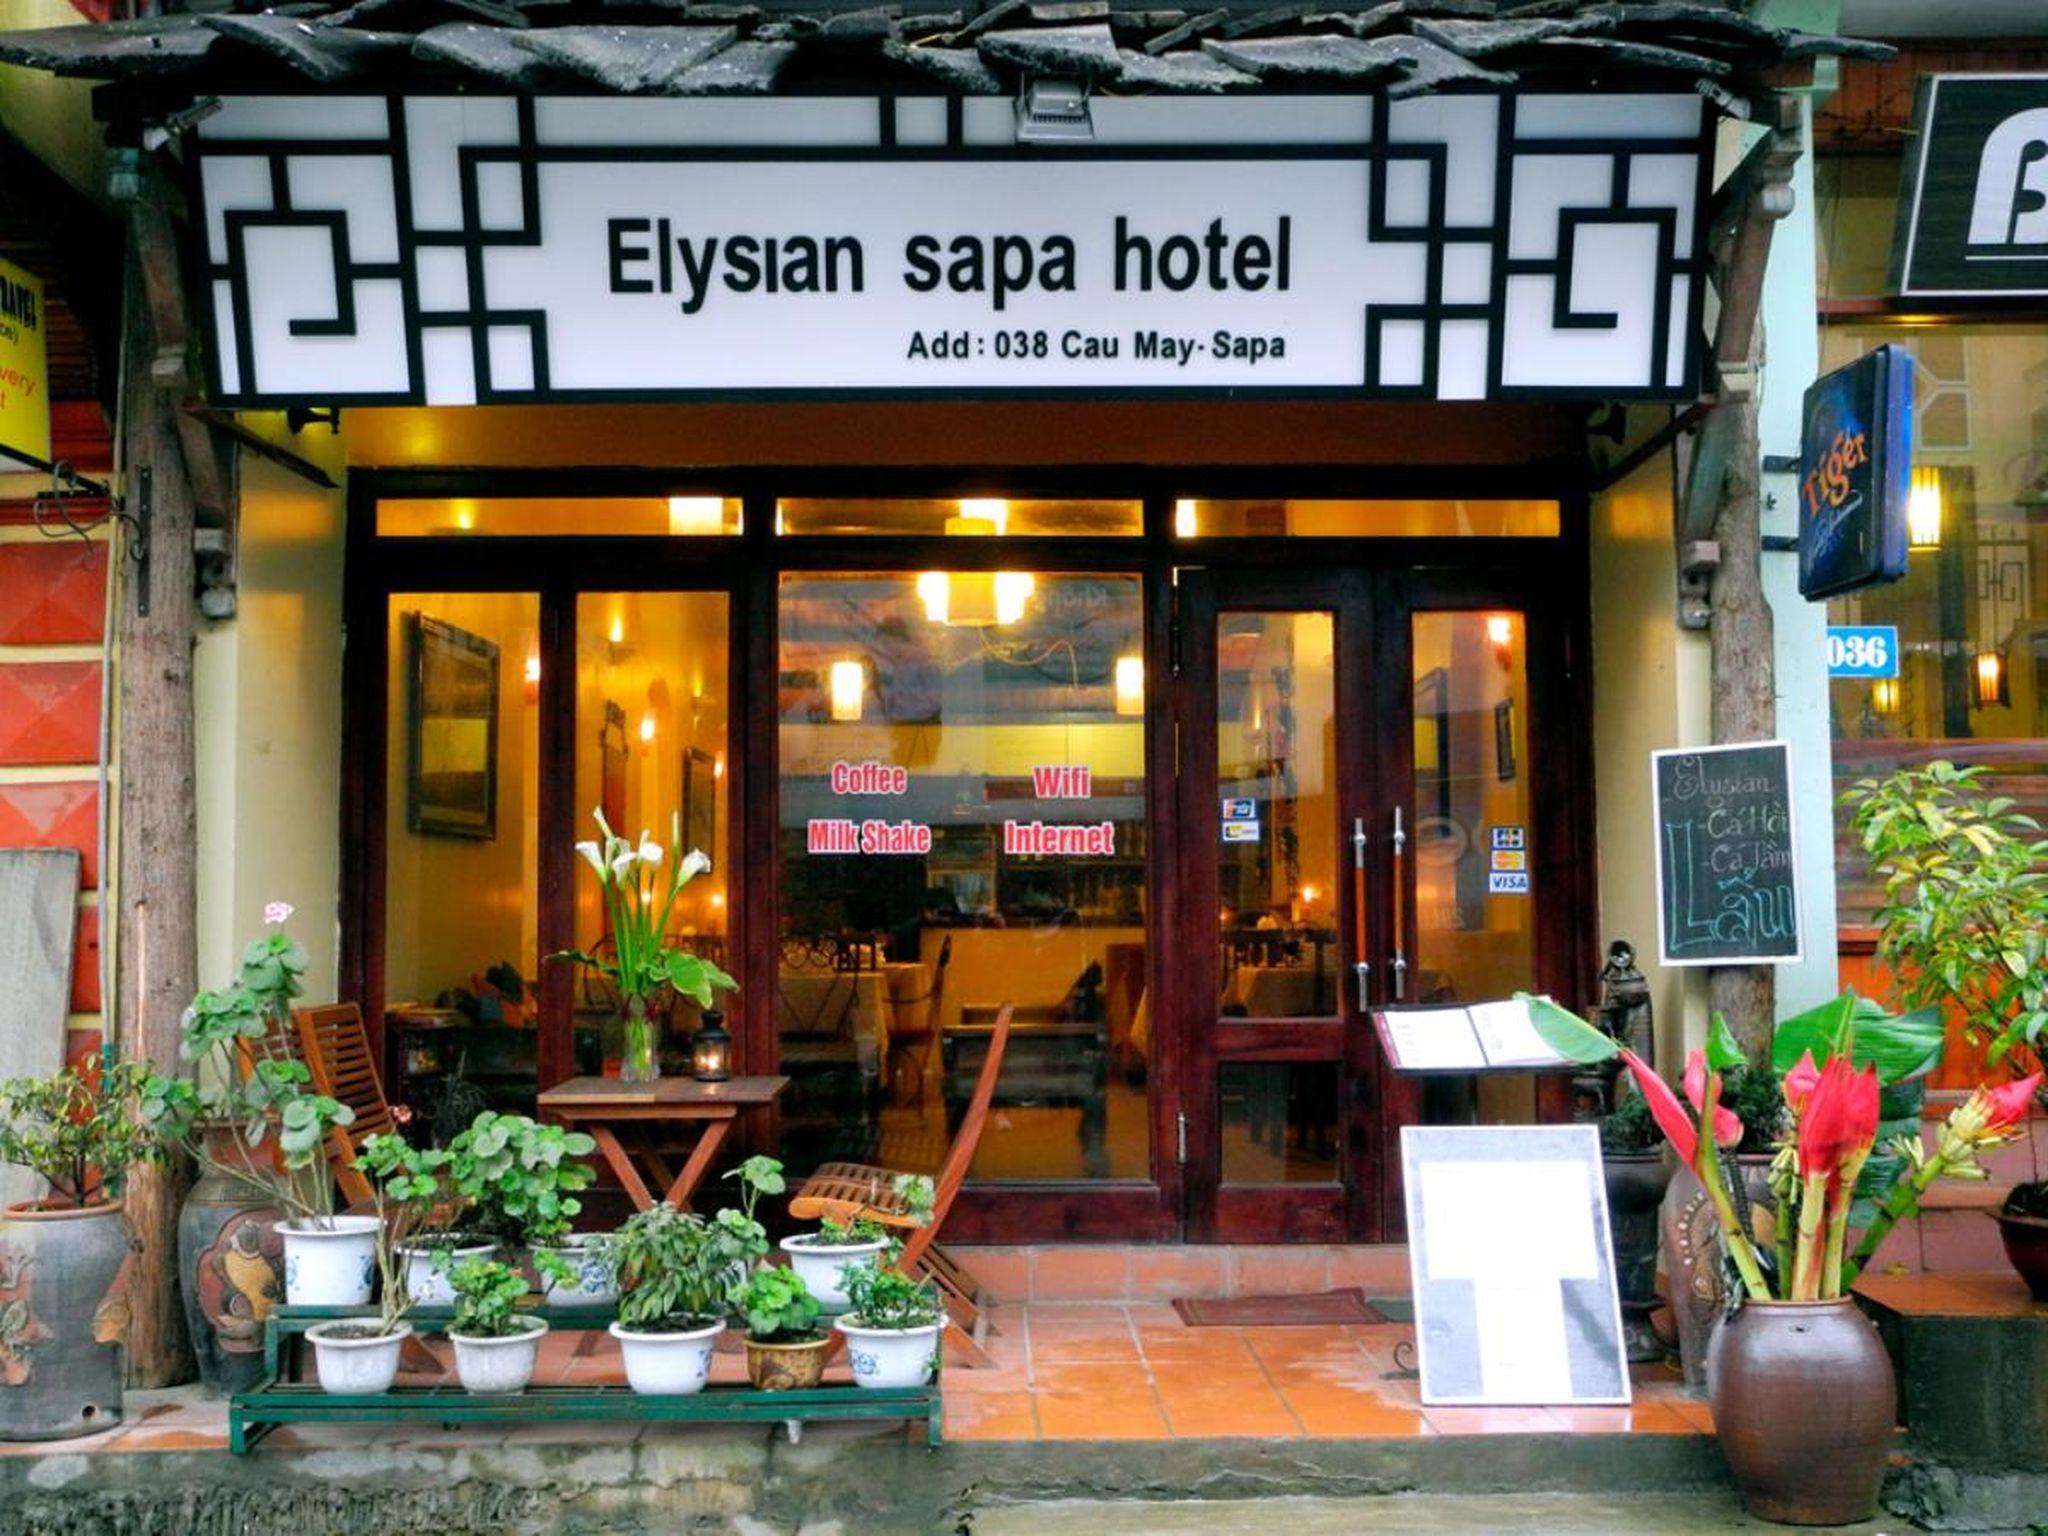 Elysian Sapa Hotel